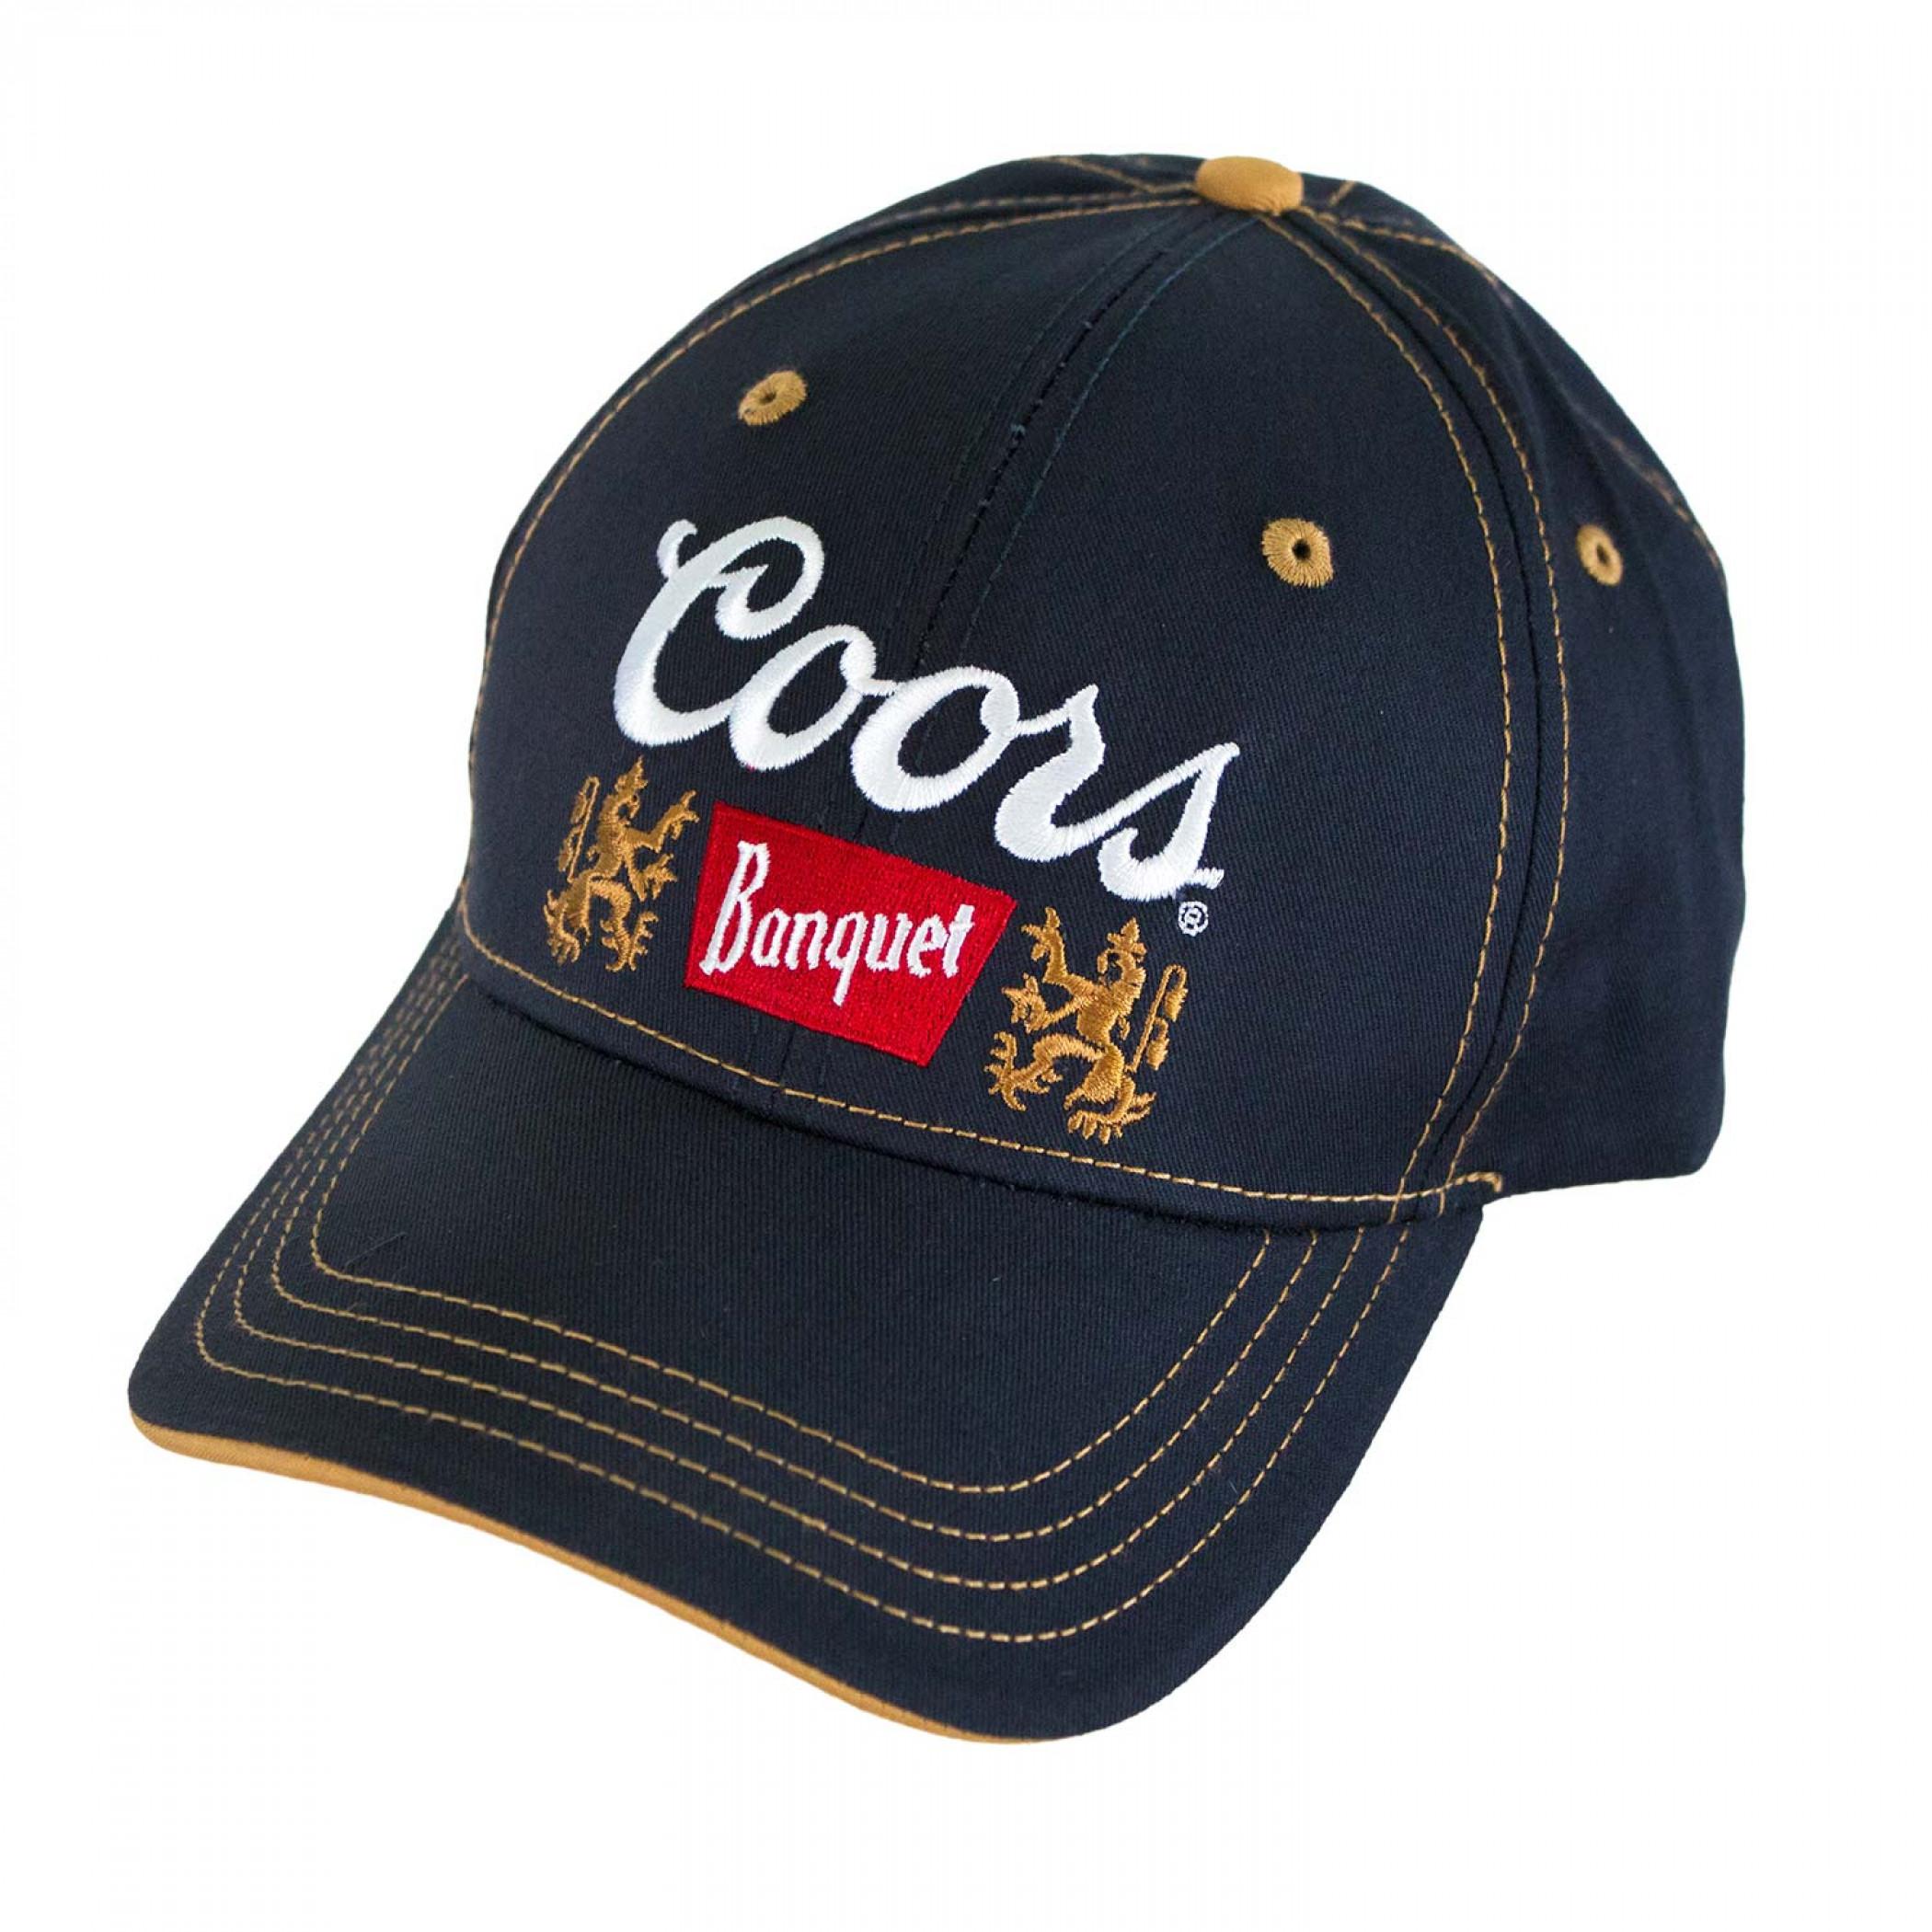 Coors Banquet Hat